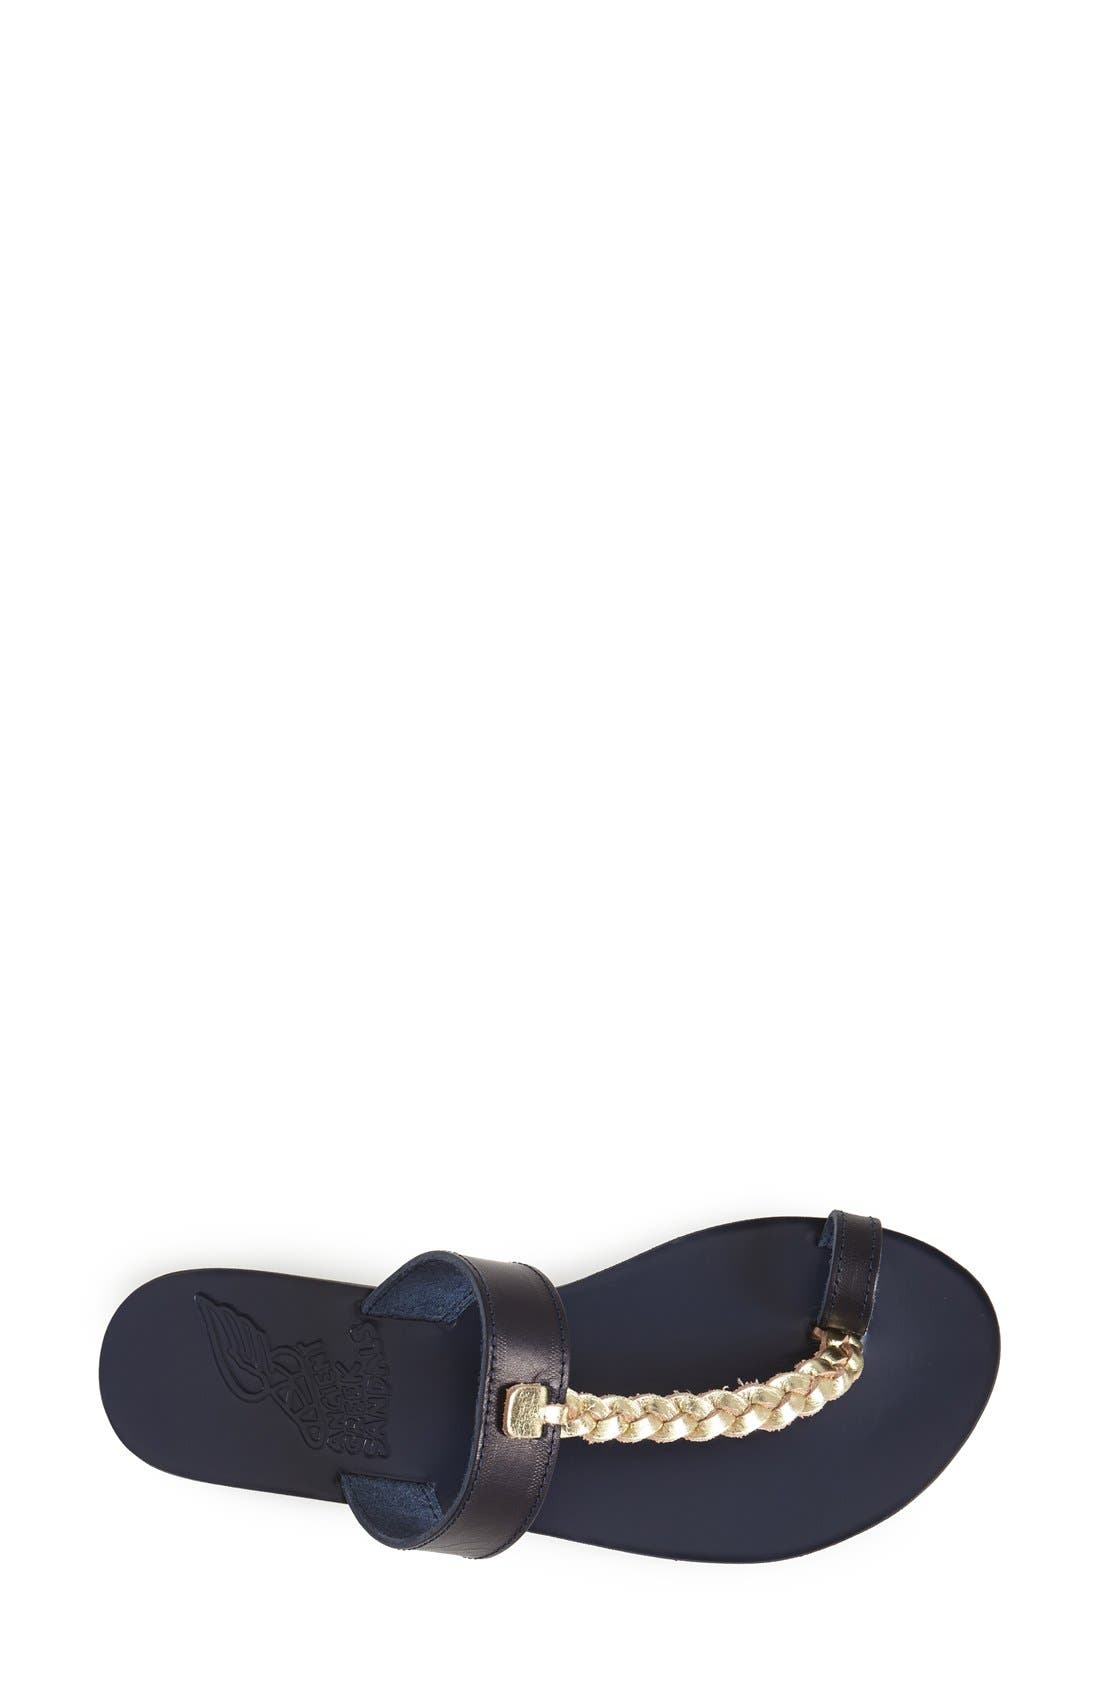 Alternate Image 3  - Ancient Greek Sandals 'Melpomeni' Leather Sandal (Women)